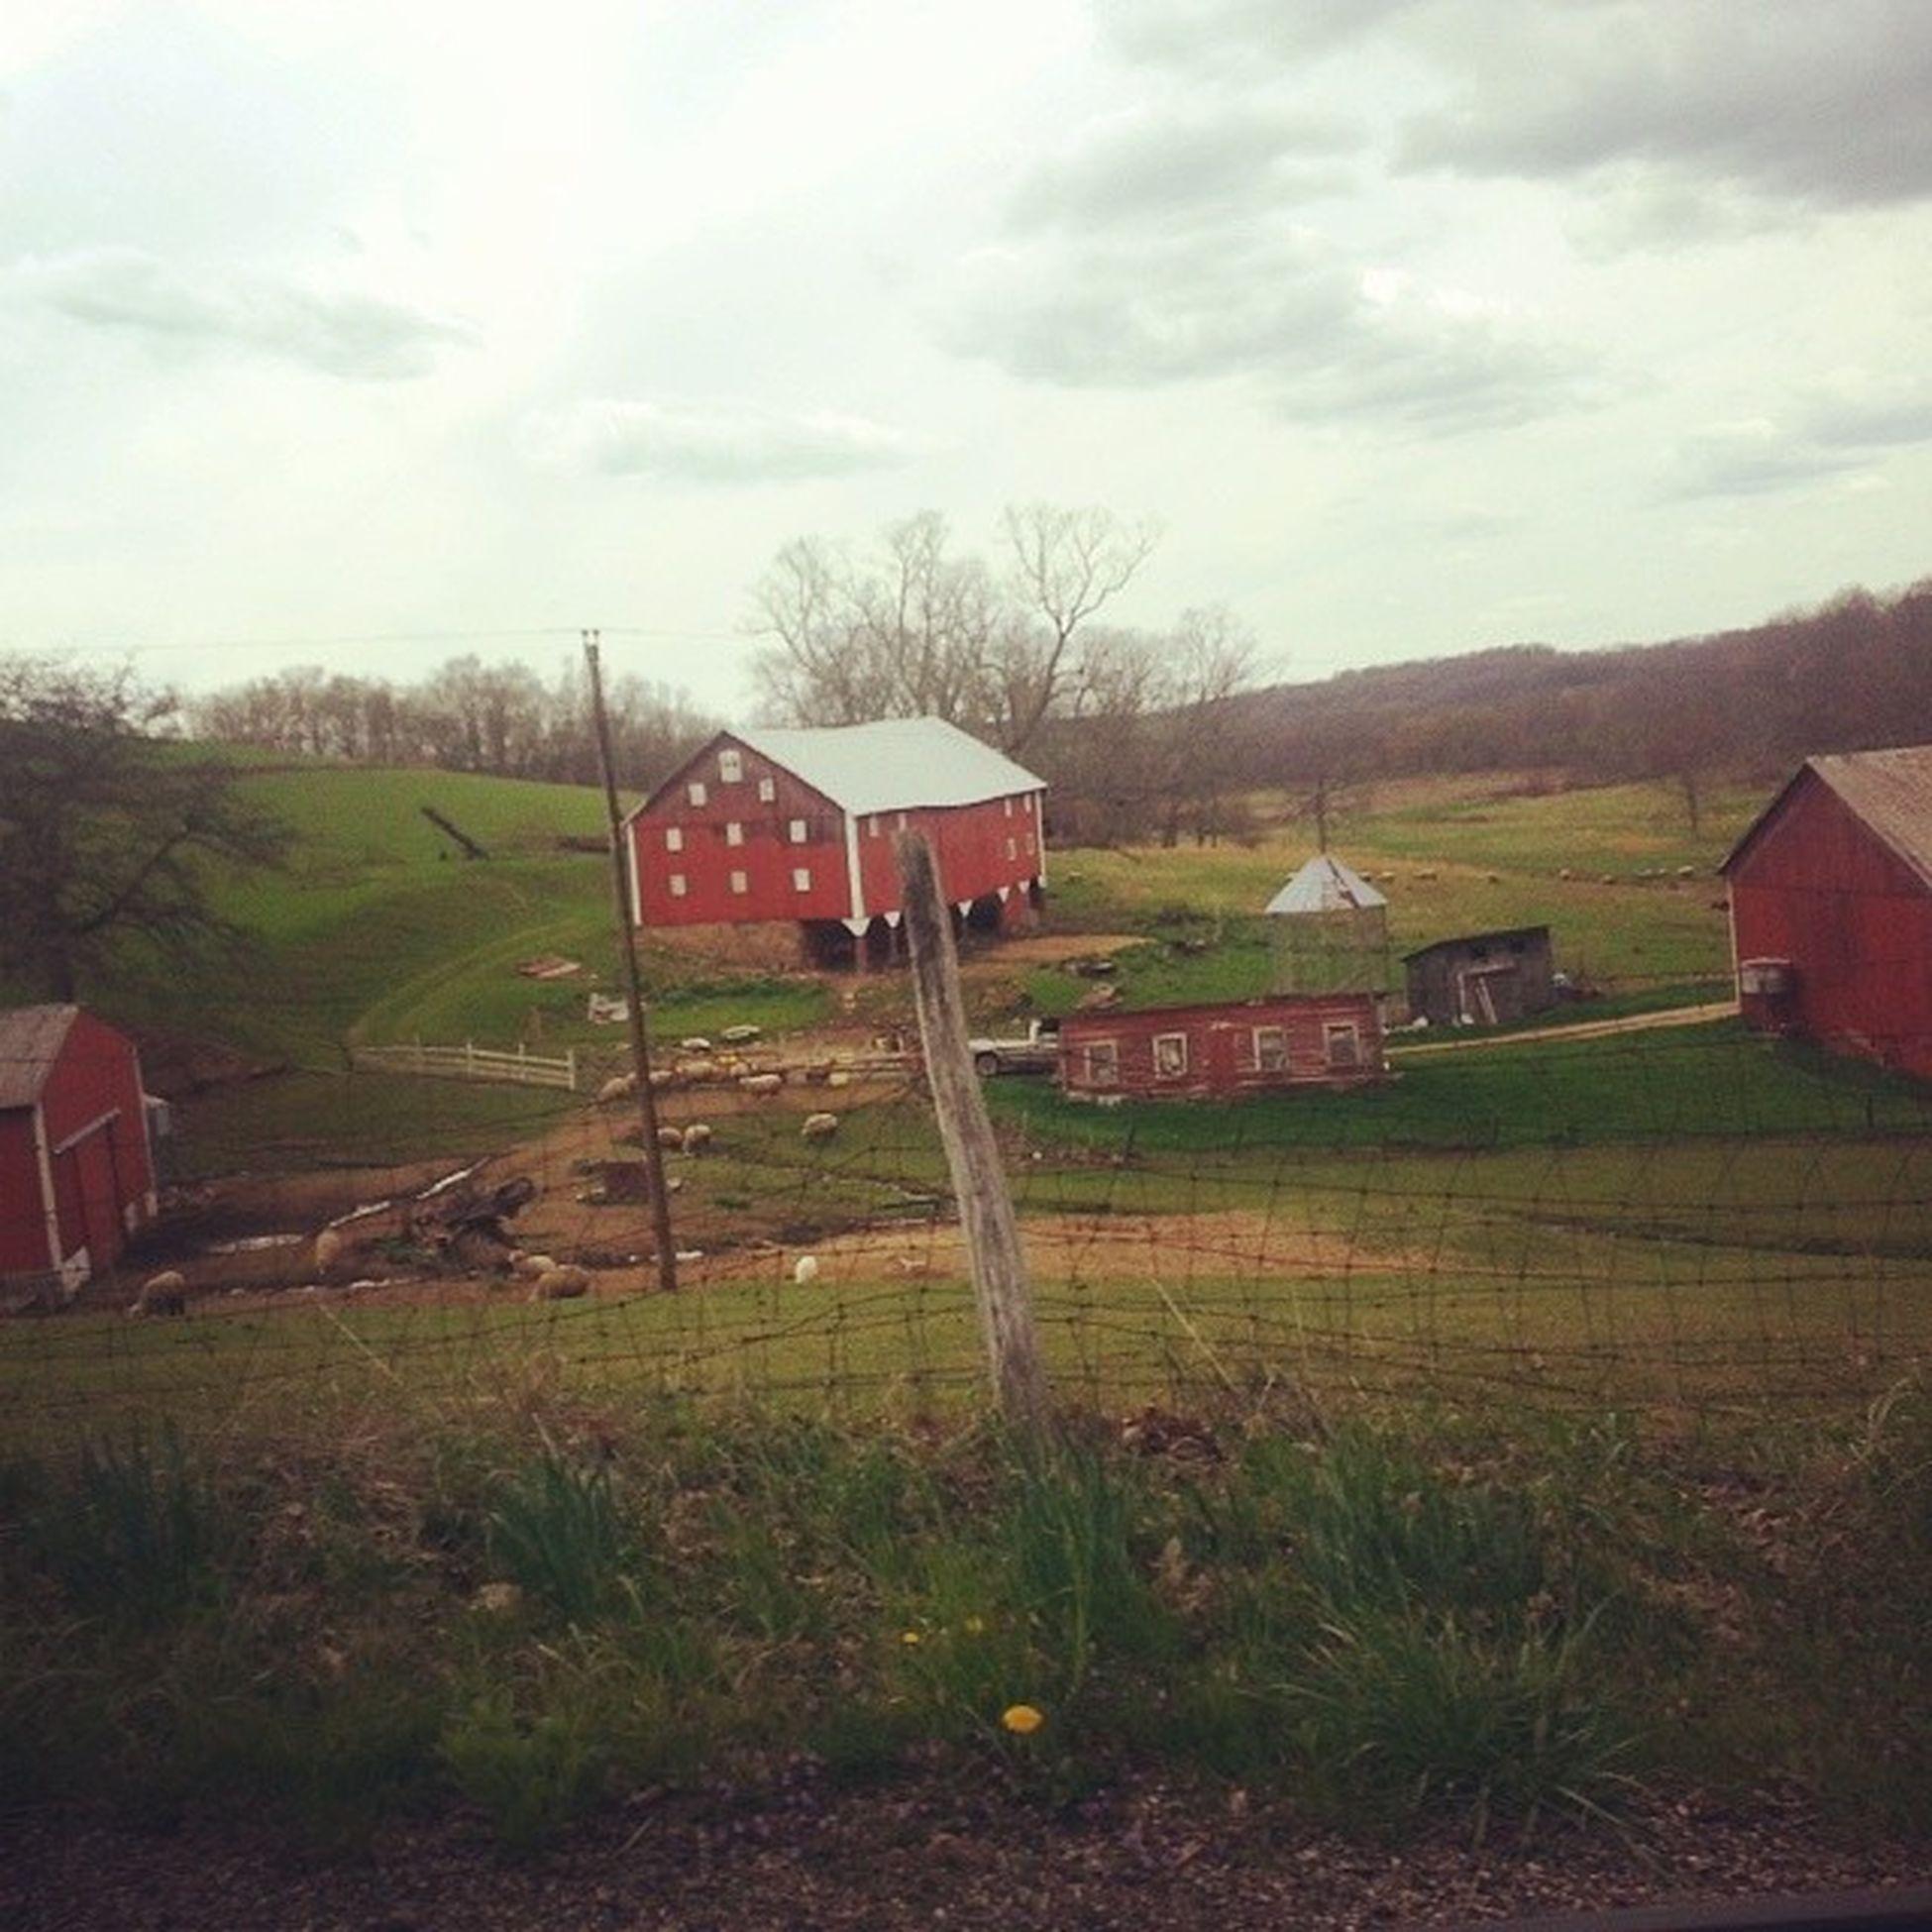 On a random Sunday drive I came across some really pretty scenes. Malvern Ohio Farms OhioFarms Landscapes Barn OhioBarns